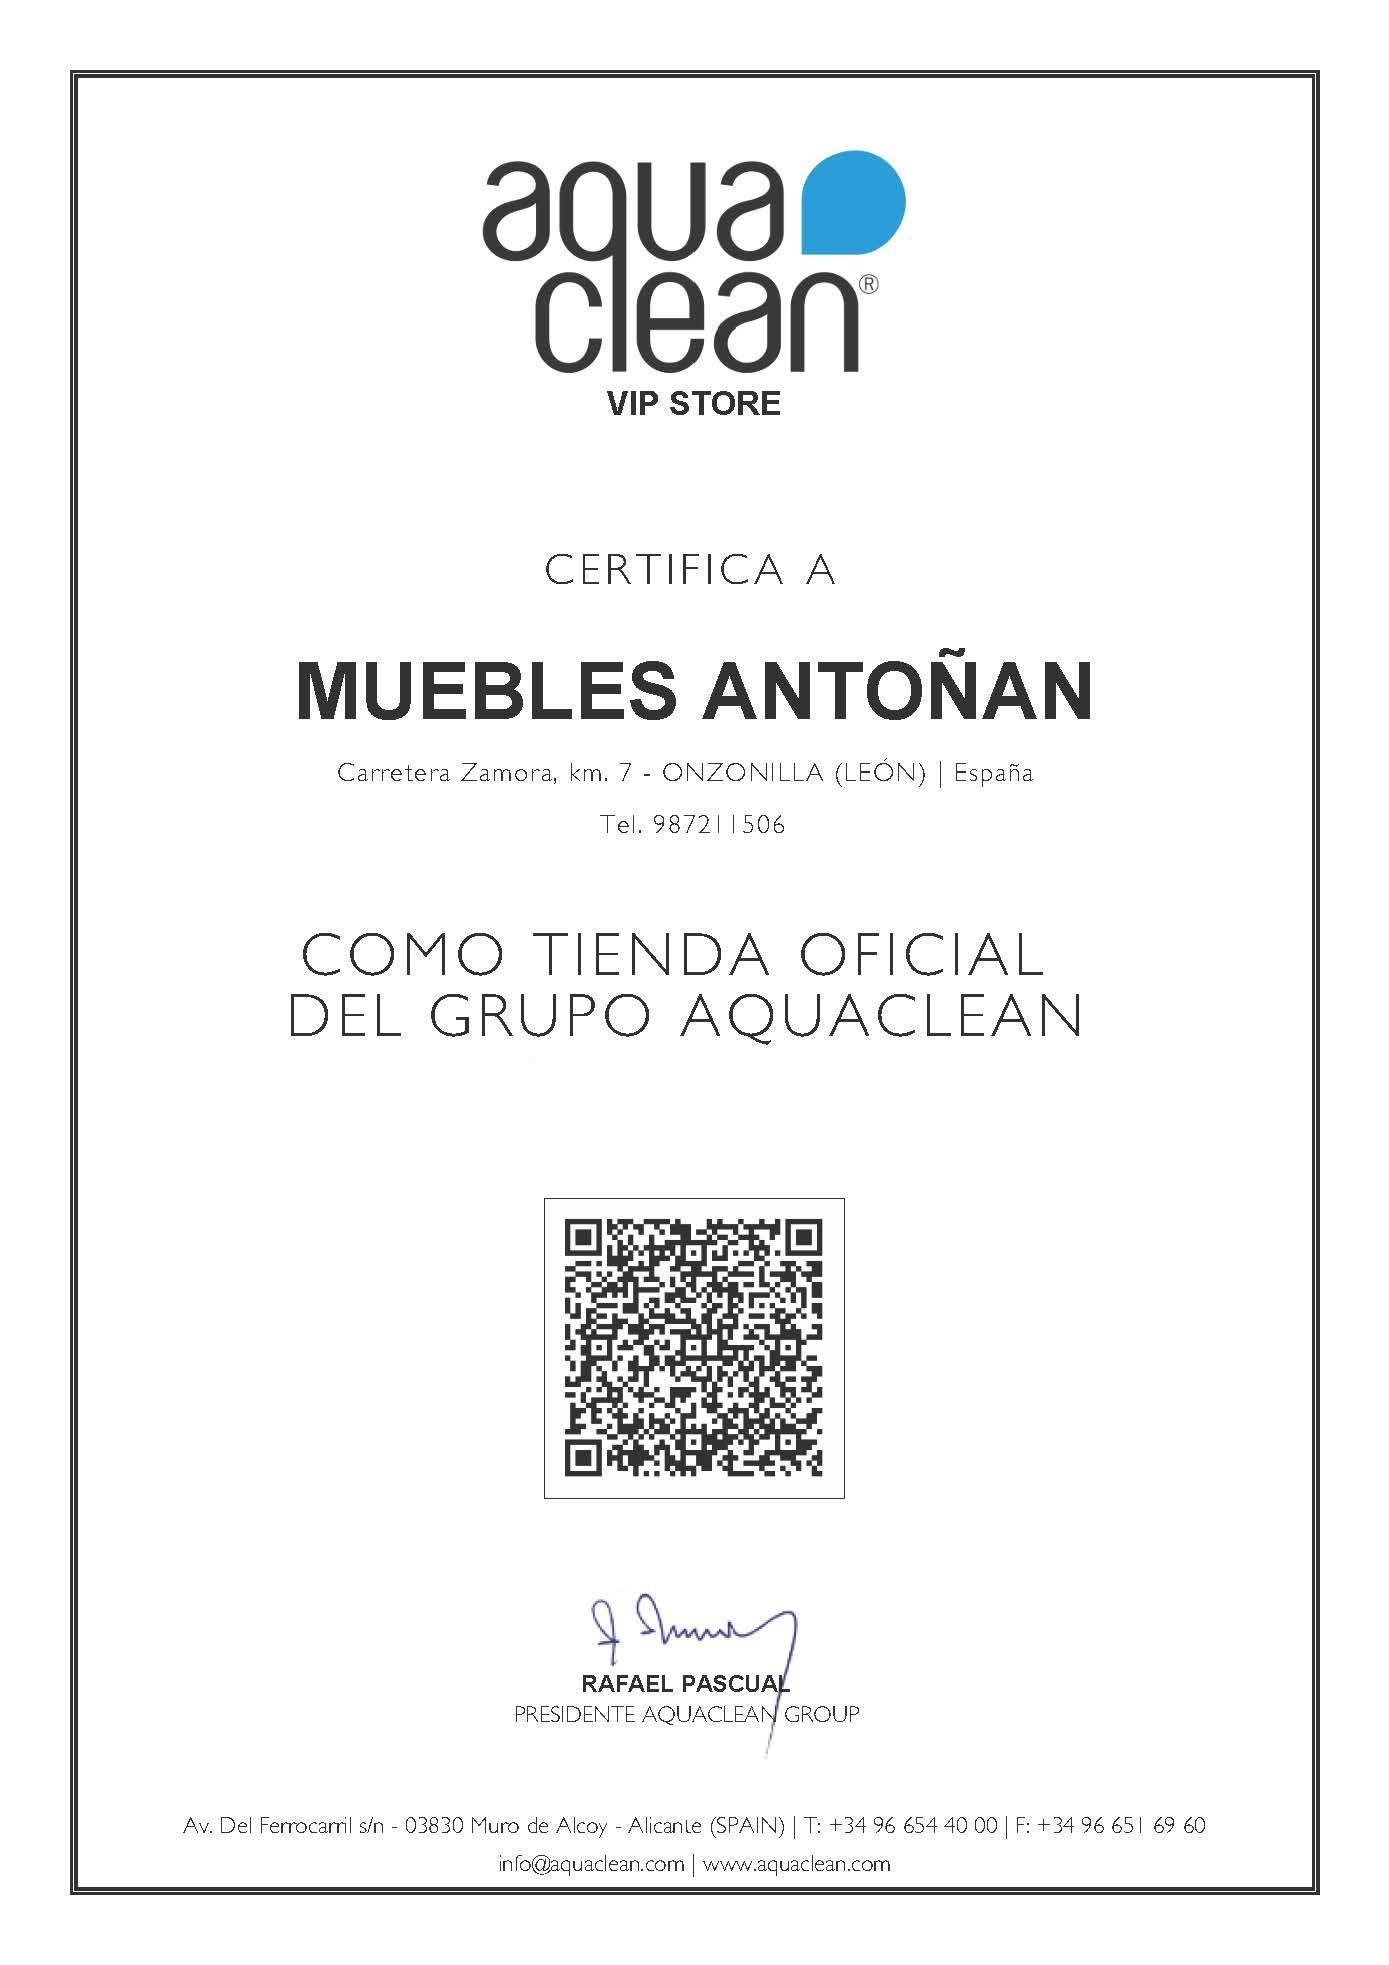 Muebles Antoñán aquaclean VIP STORE CERTIFICADO TIENDA OFICIAL GRUPO AQUACLEAN